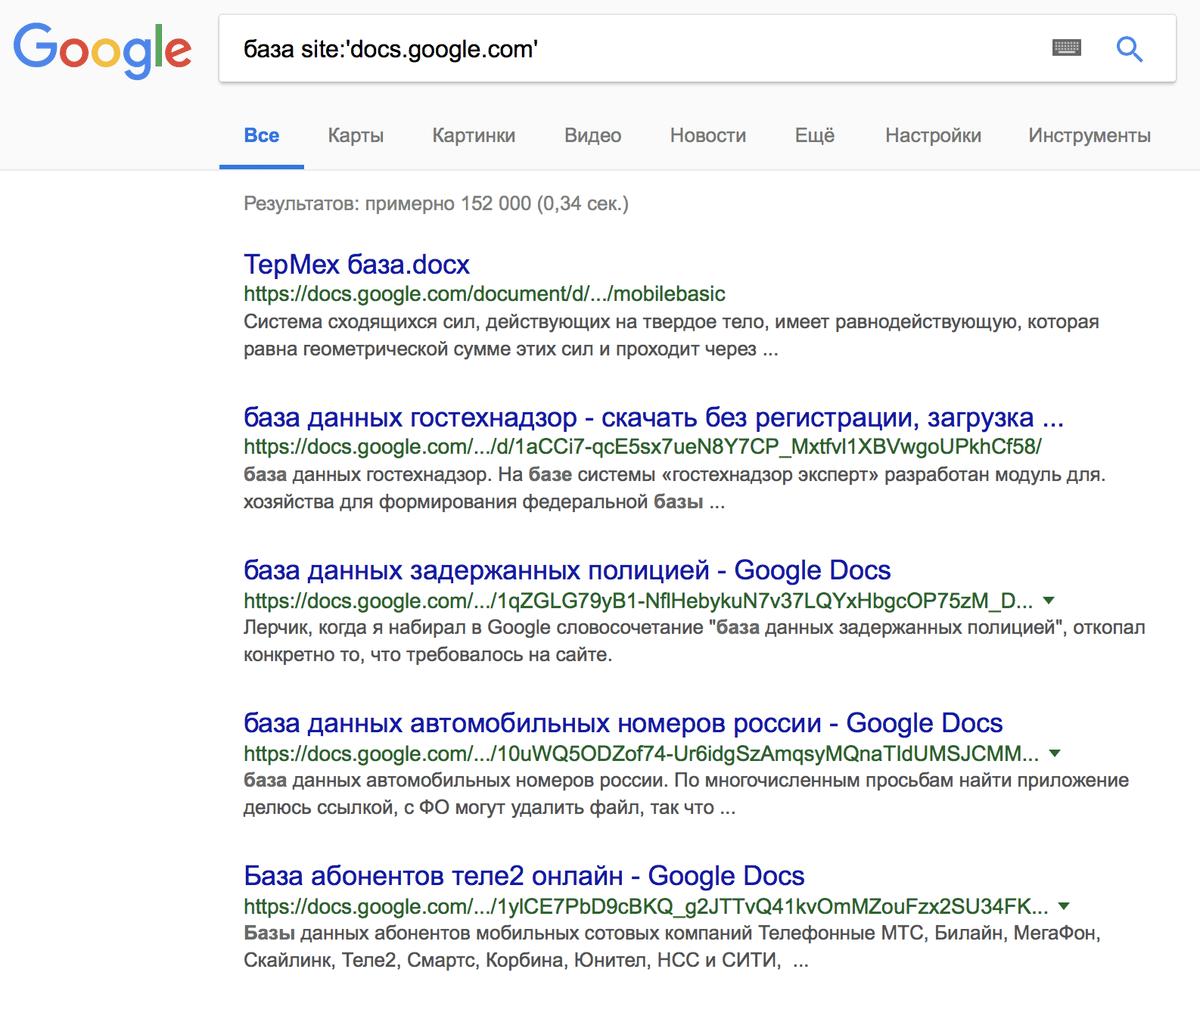 Гугл индексирует, но странно. Похоже на развод и рекламу